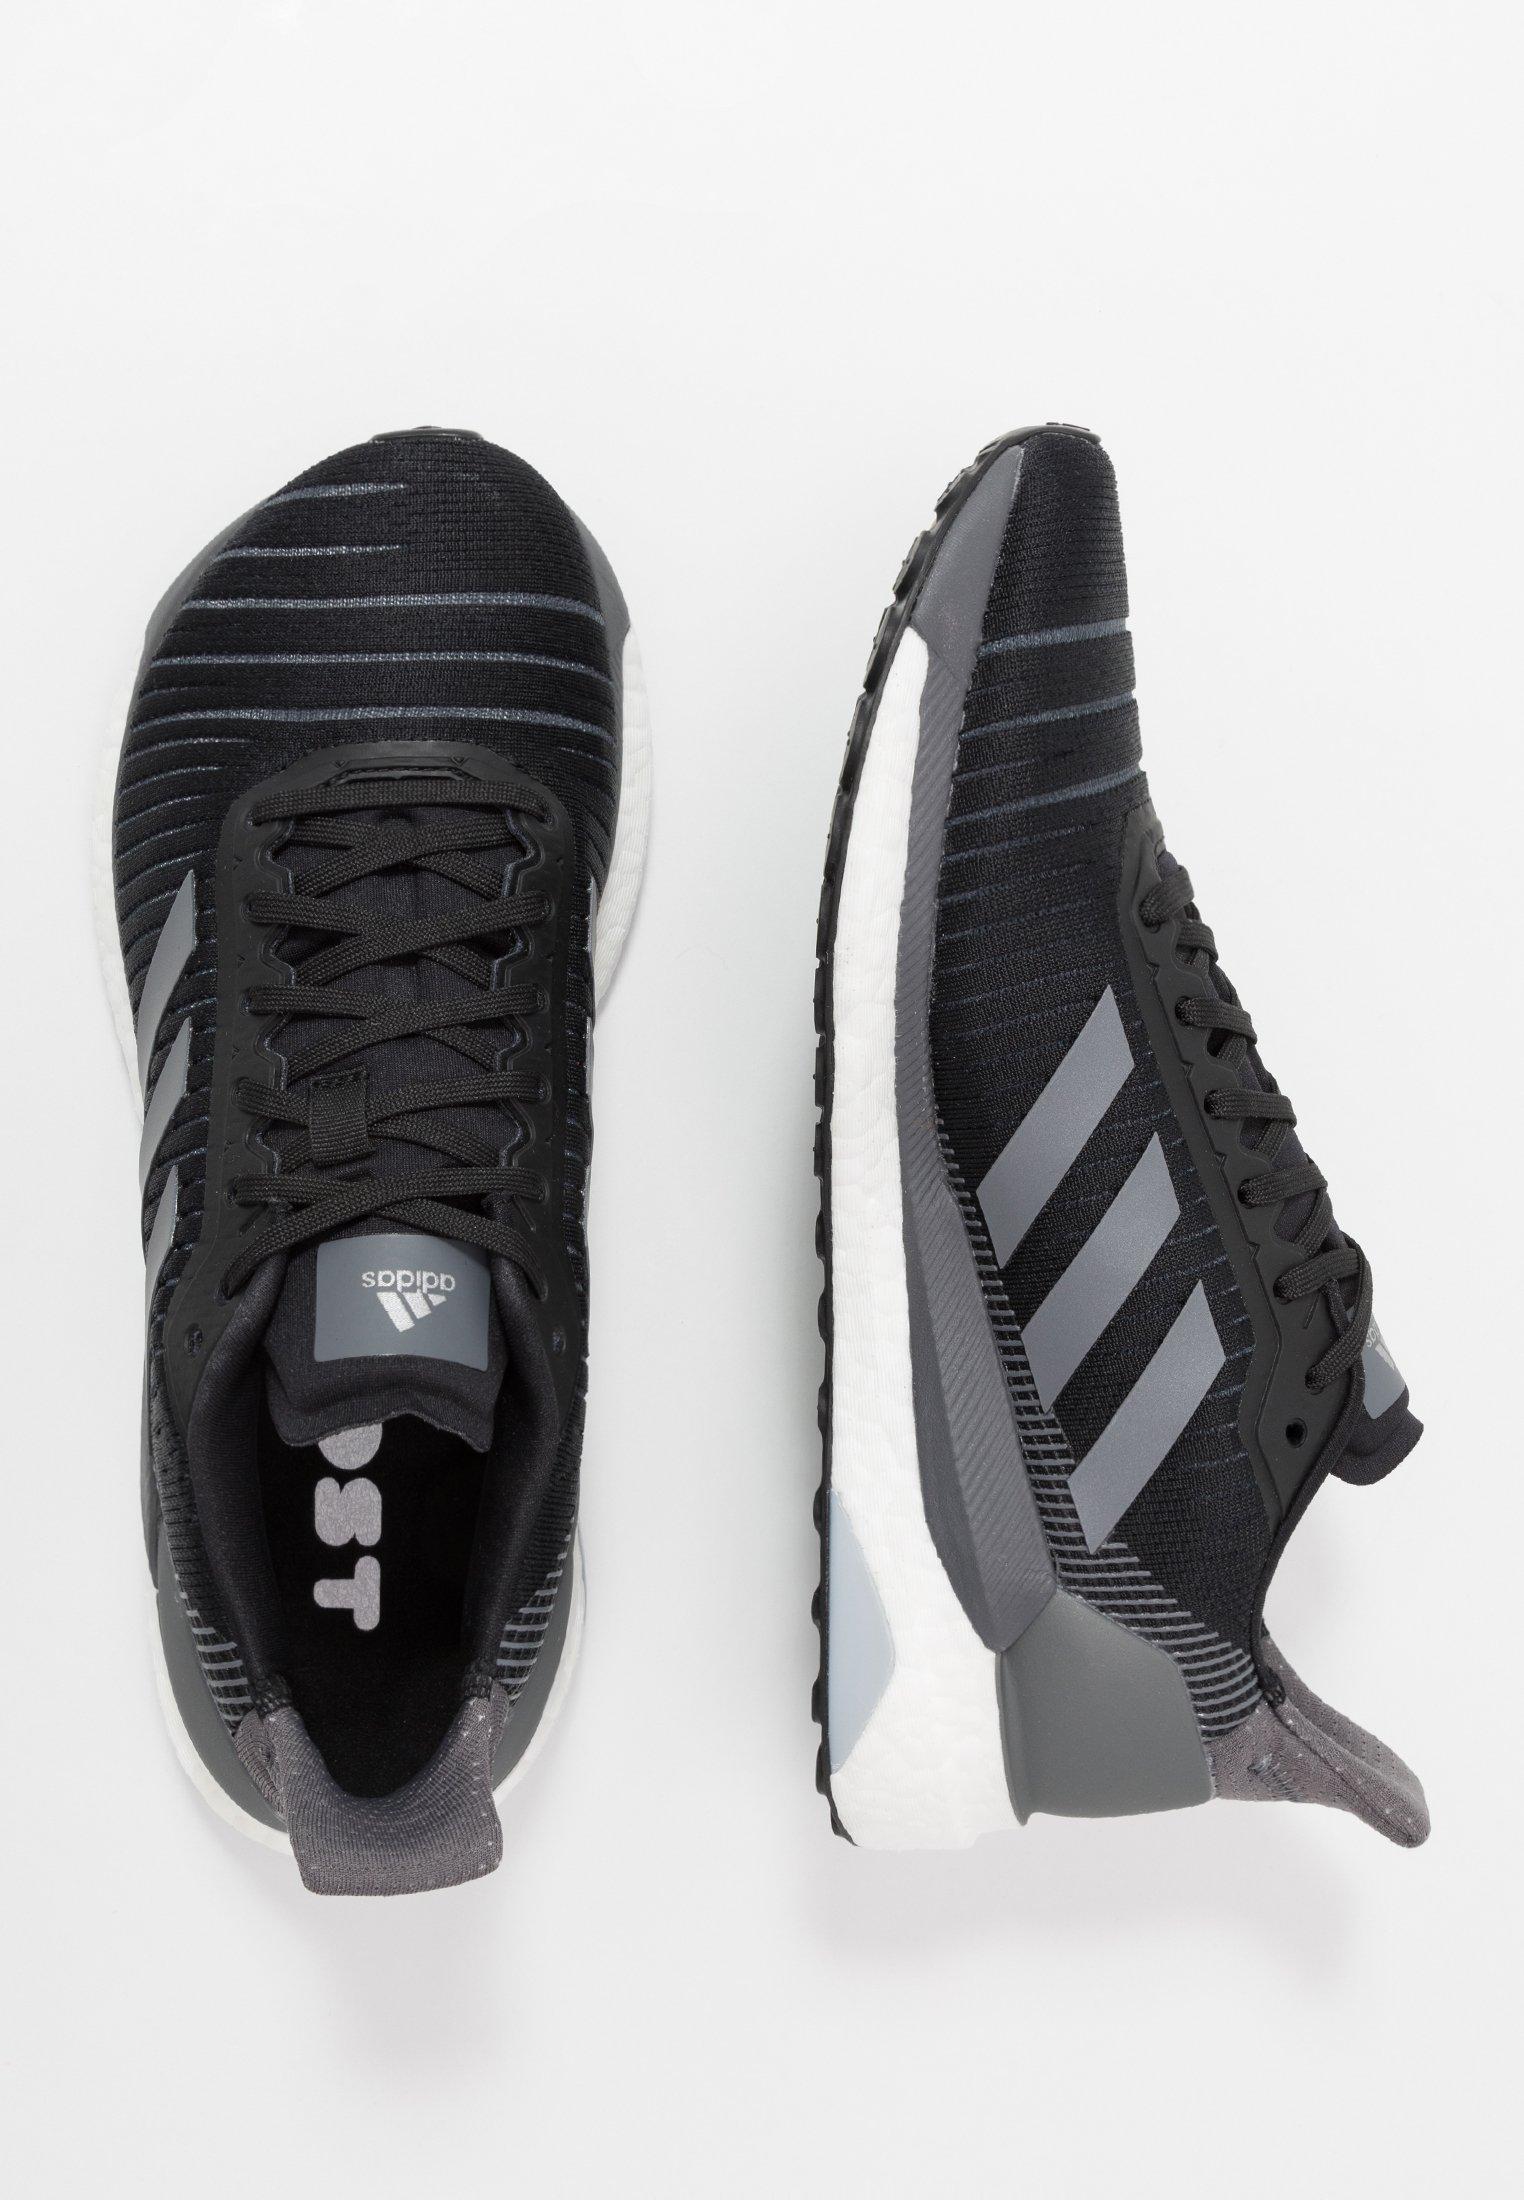 Adidas Performance Solar Glide 19 - Chaussures De Running Neutres Black 4gvFfE0